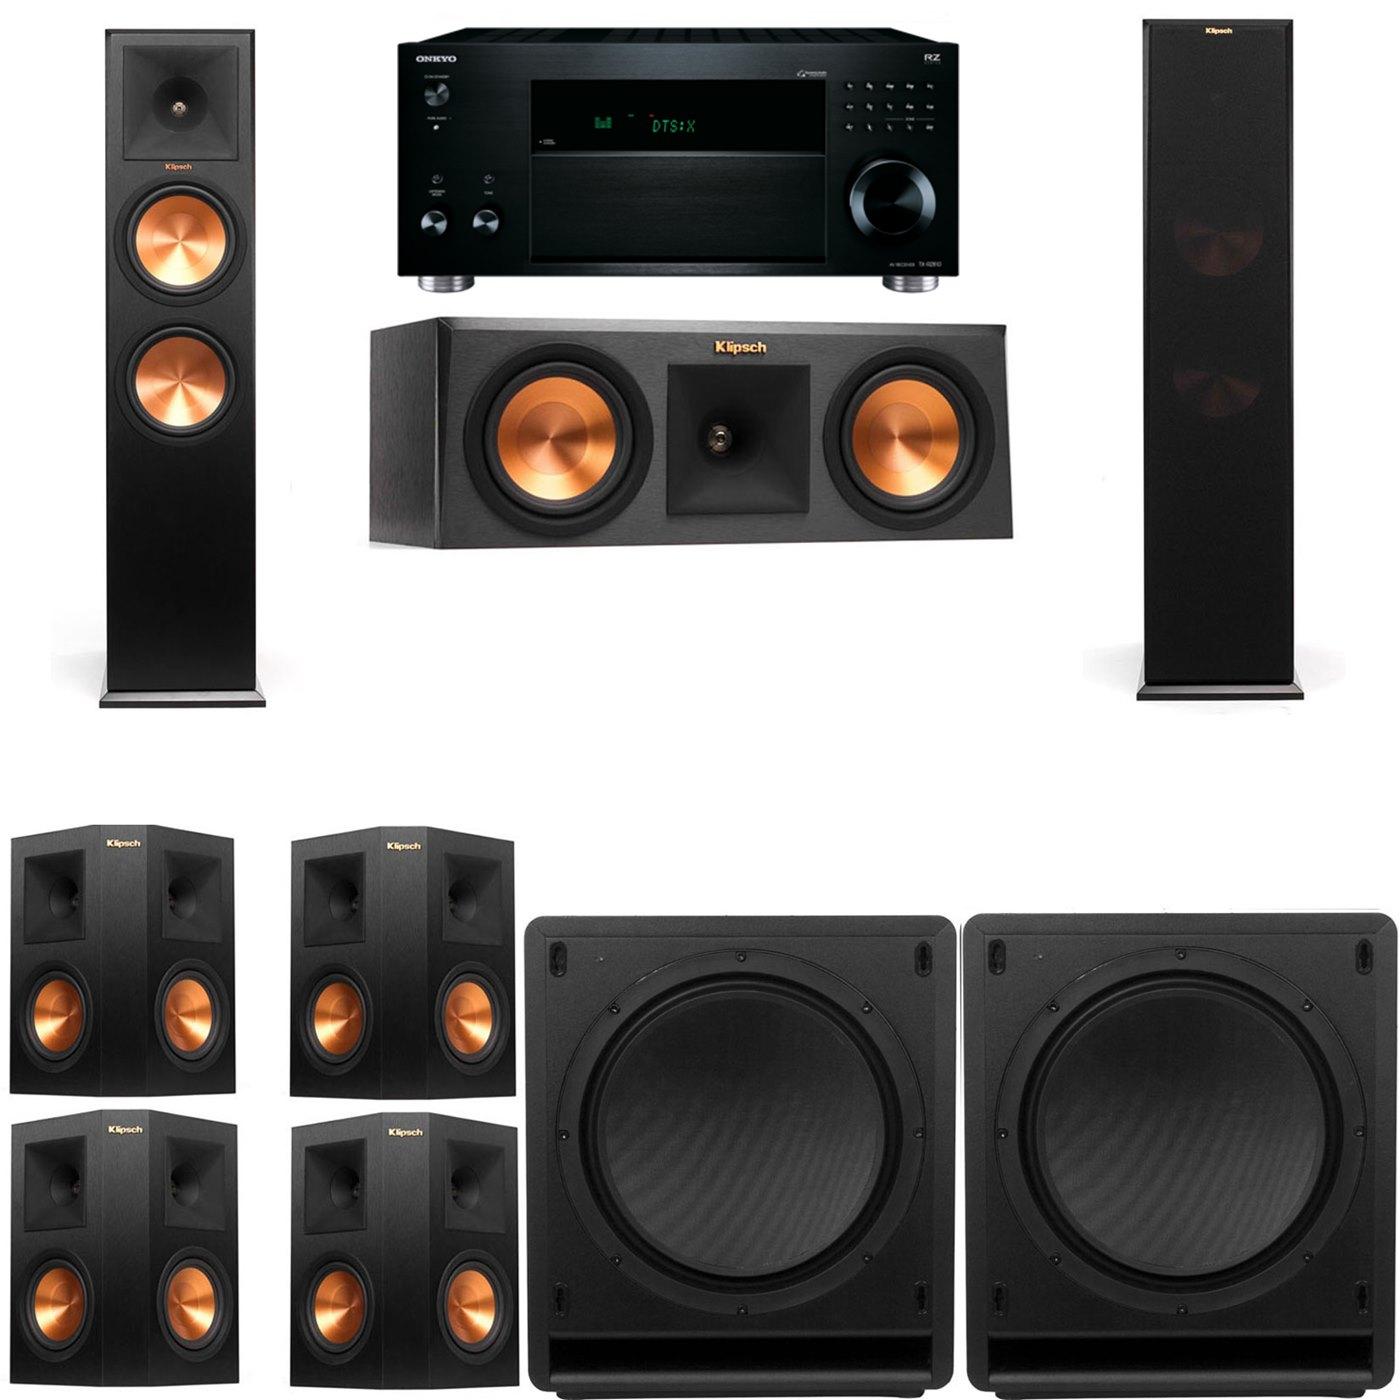 Klipsch RP-280F Tower Speakers-RP-250C-SW-112-7.2-Onkyo TX-RZ810